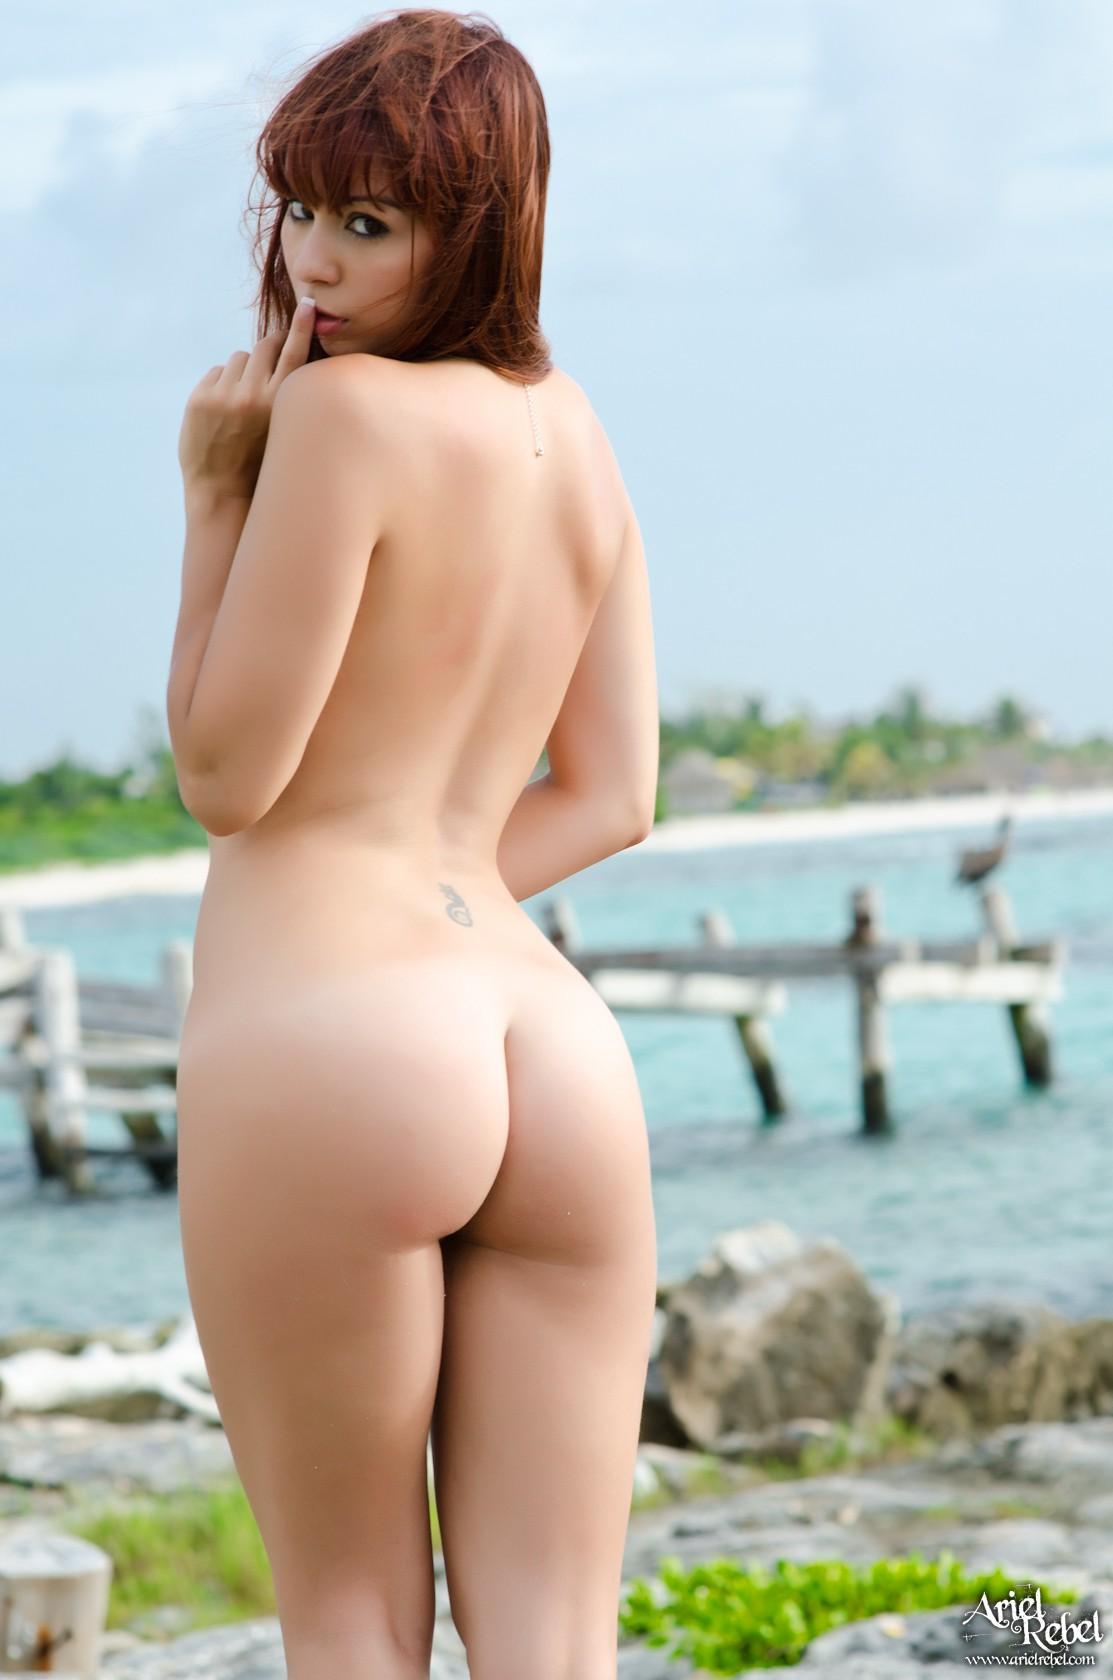 ariel rebel голые фото